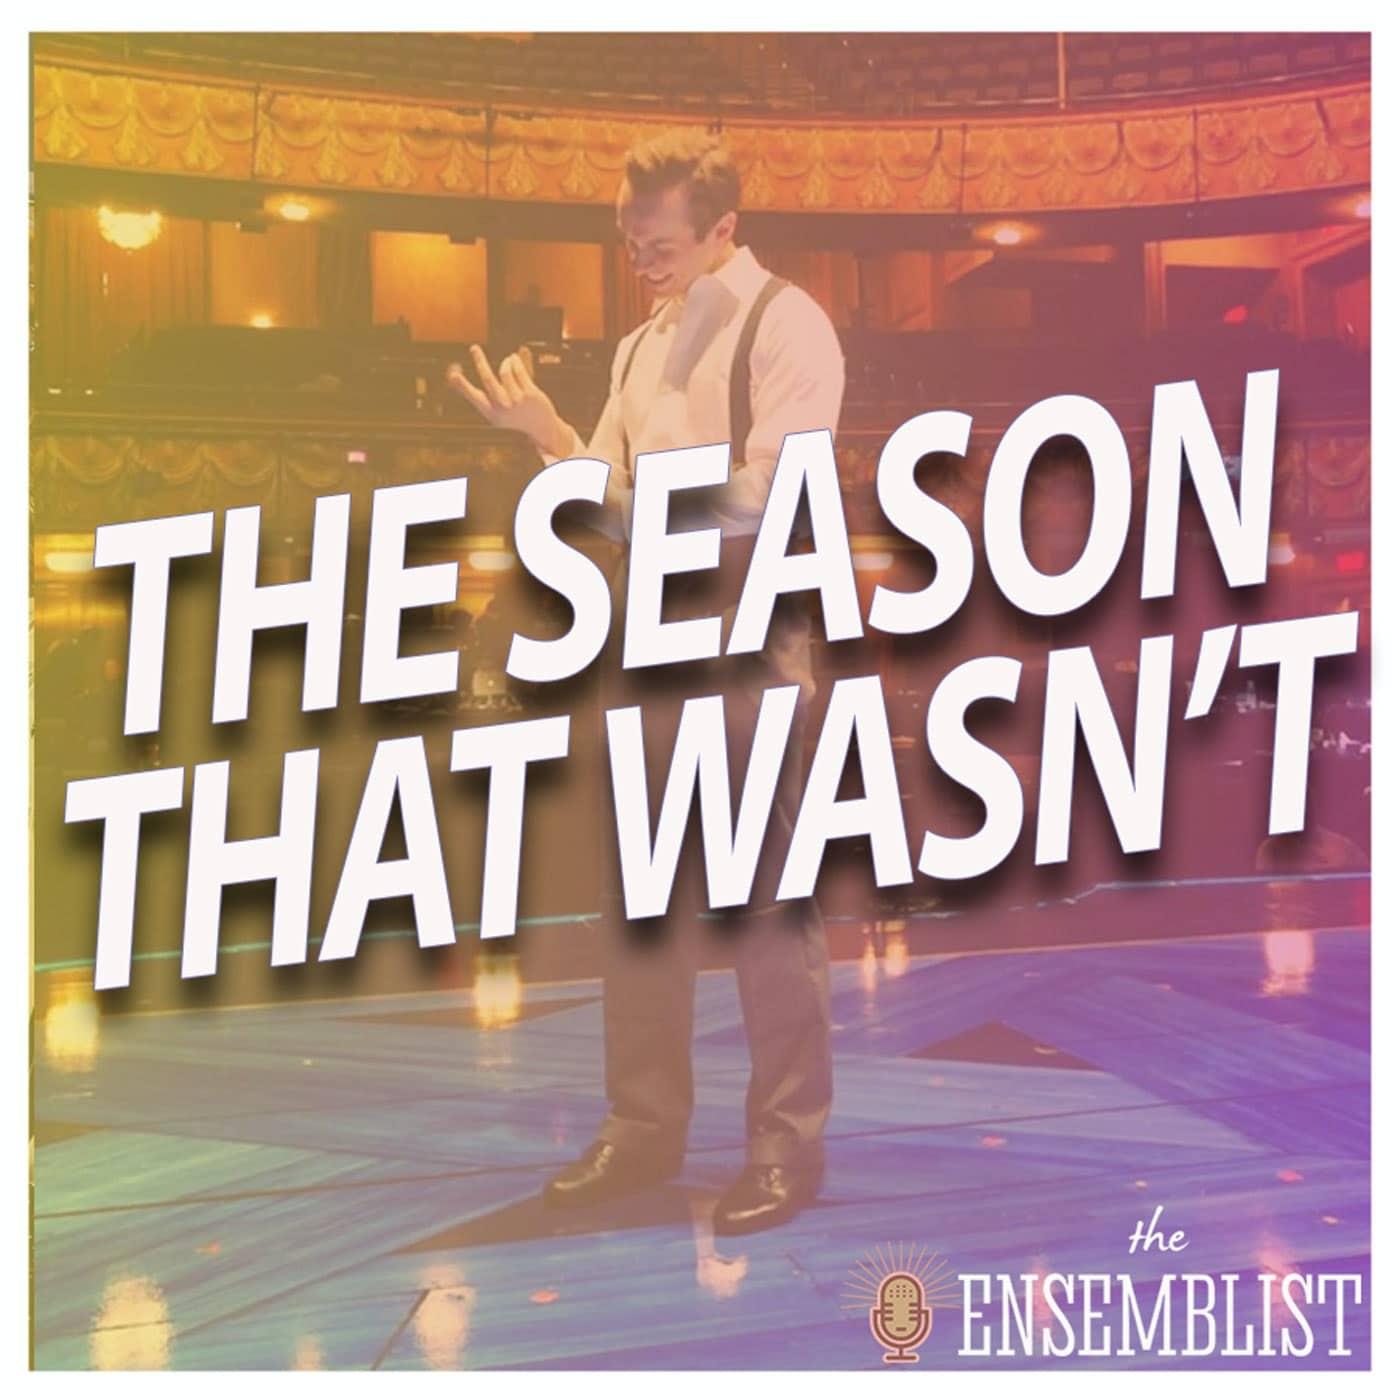 The Ensemblist #306 - The Season That Wasn't (Part 1, feat. Zach Adkins, Kyle Brown, Britney Coleman, Kaleigh Cronin, DeAnne Stewart, Ricky Ubeda)